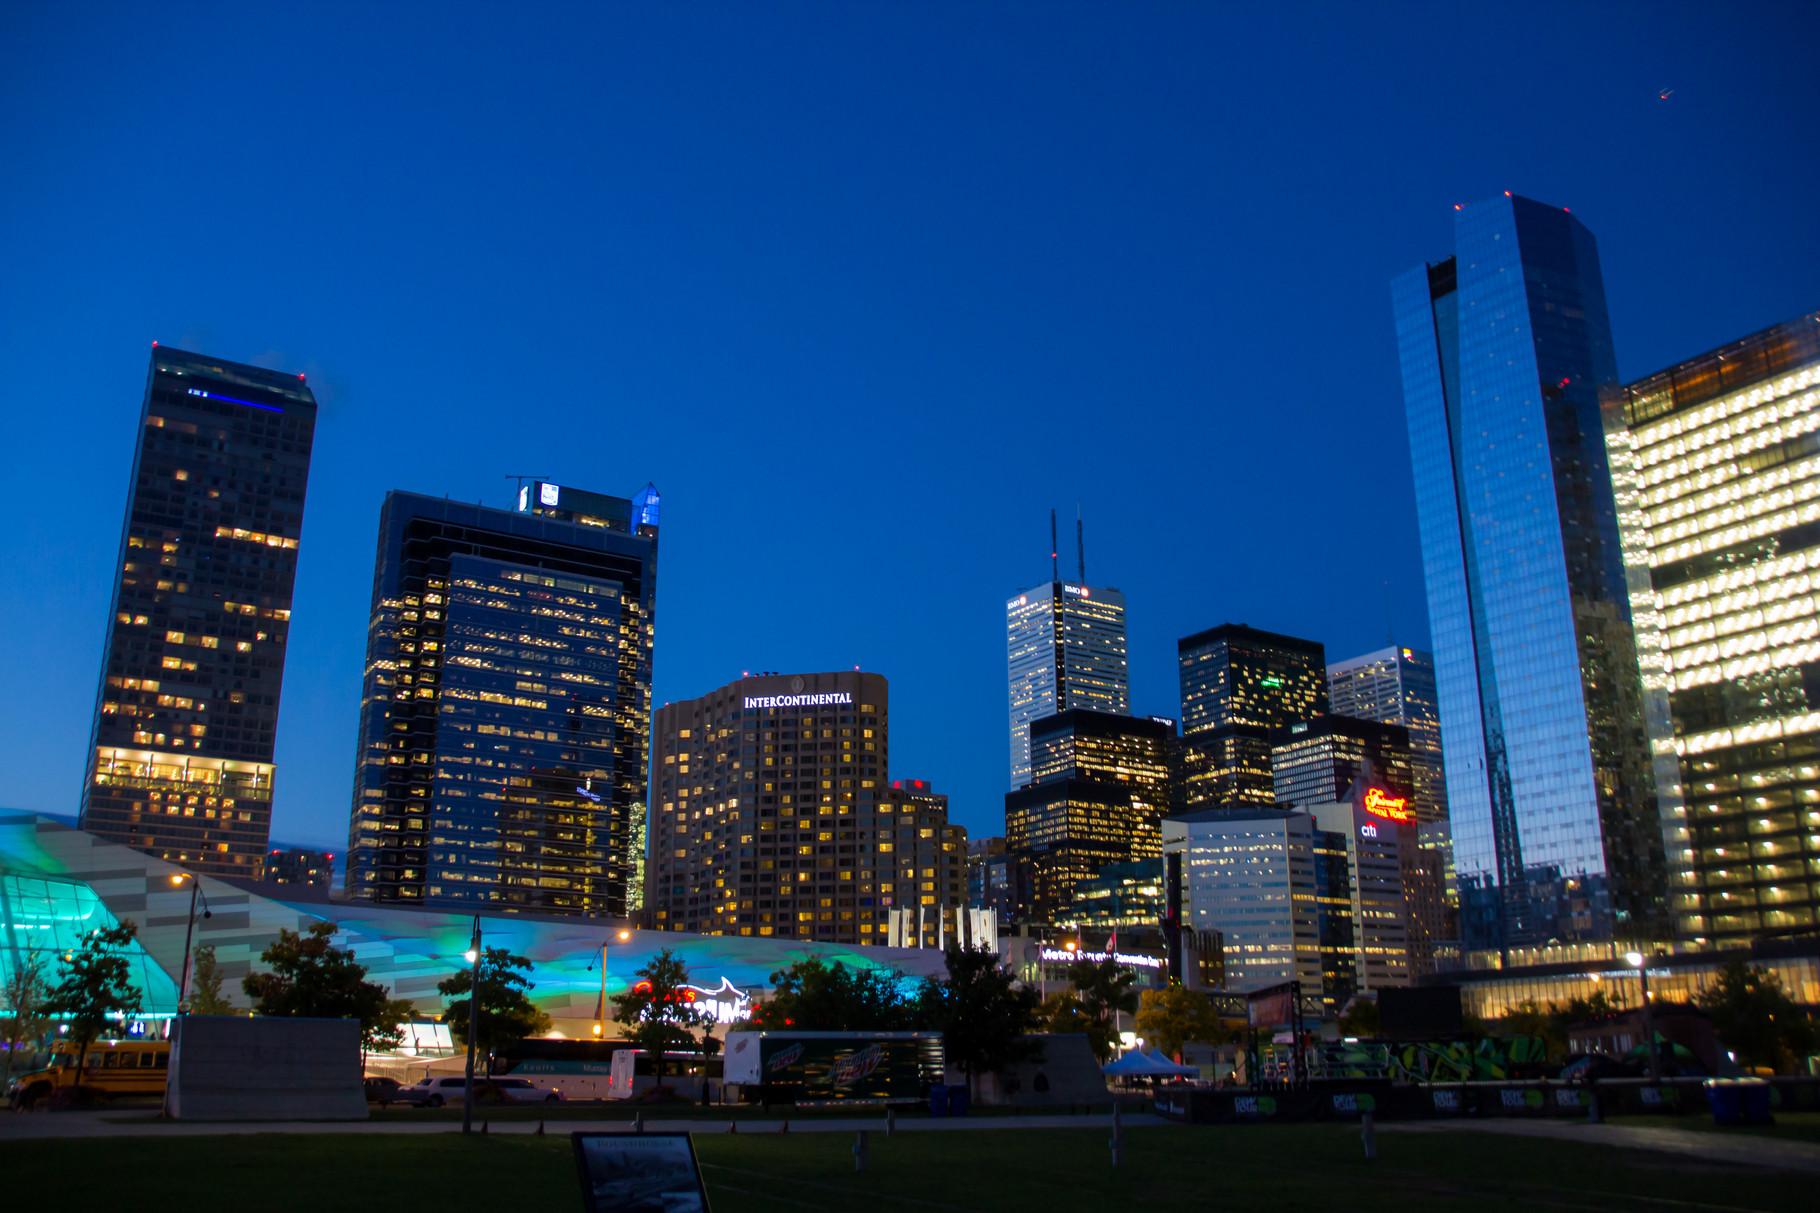 13_Toronto bei Nacht.